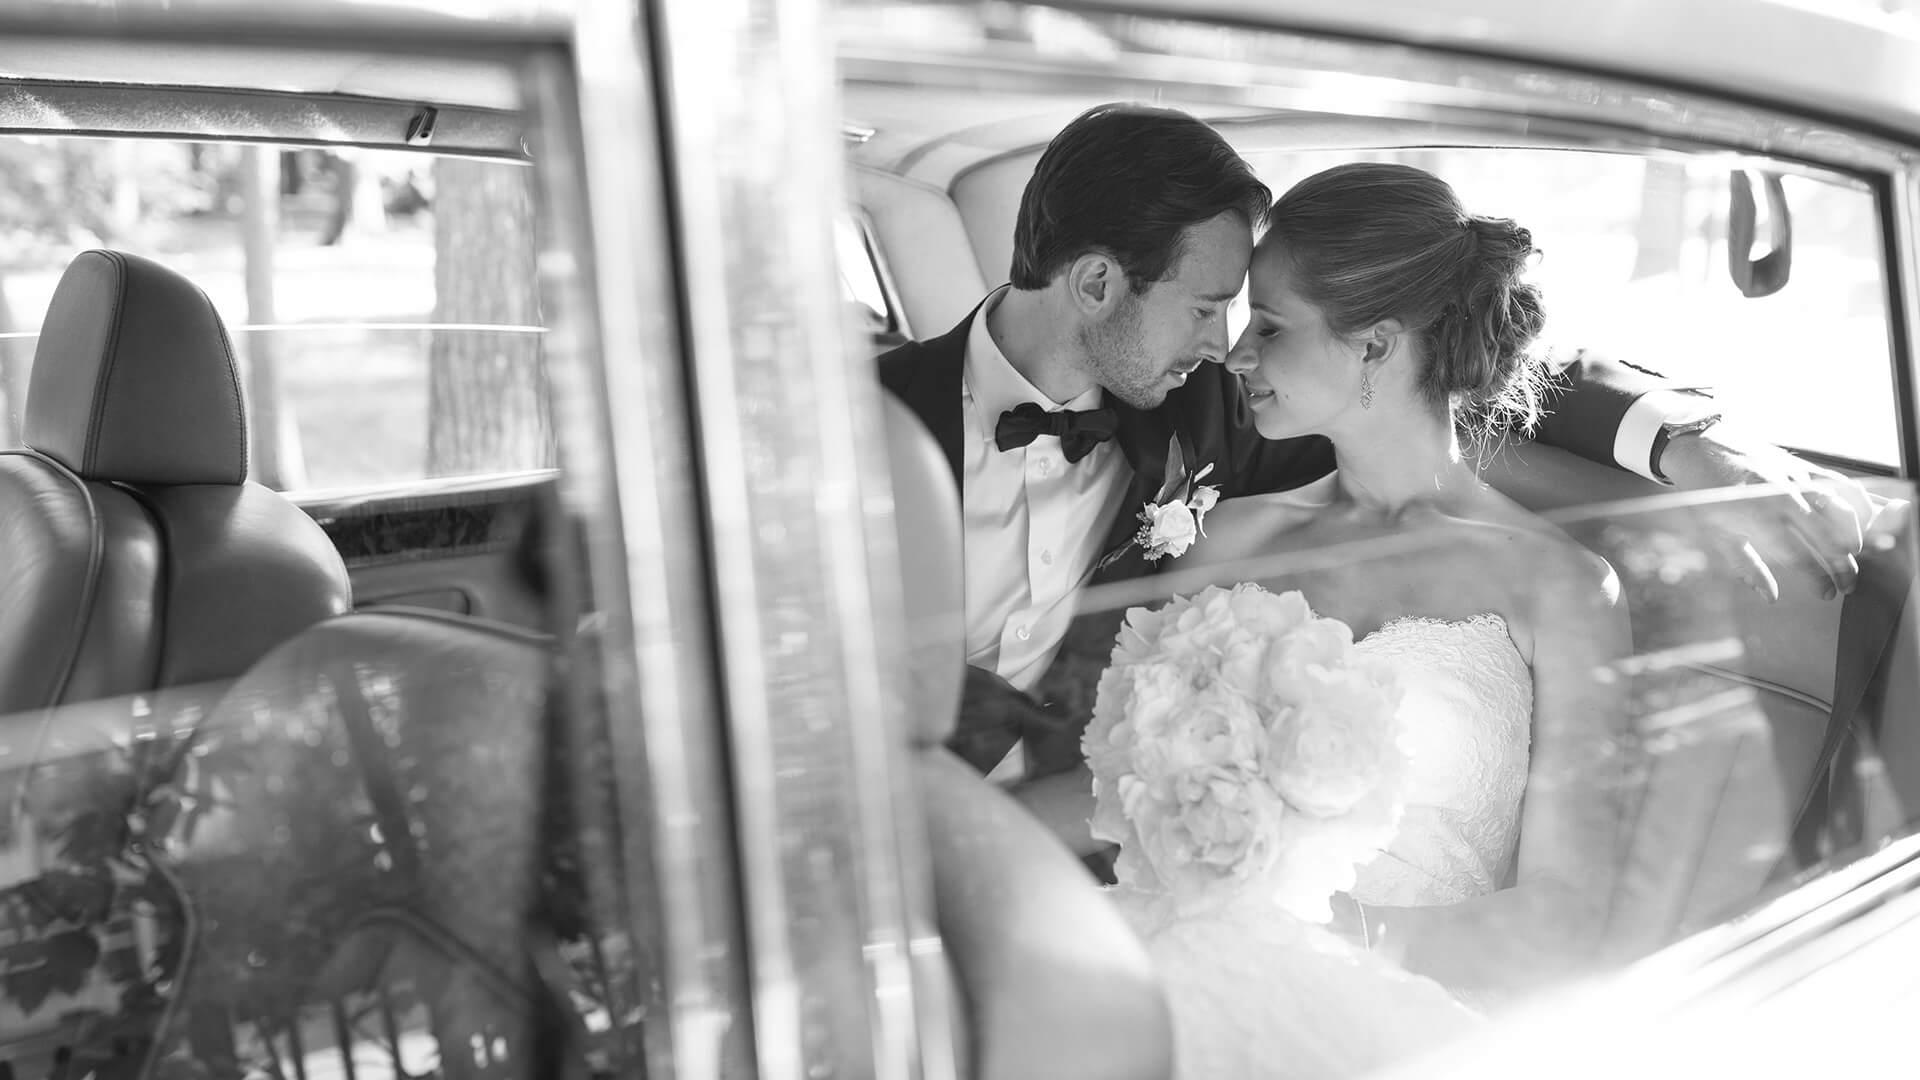 Photographe Mariage Portrait | Québec | Annie Simard